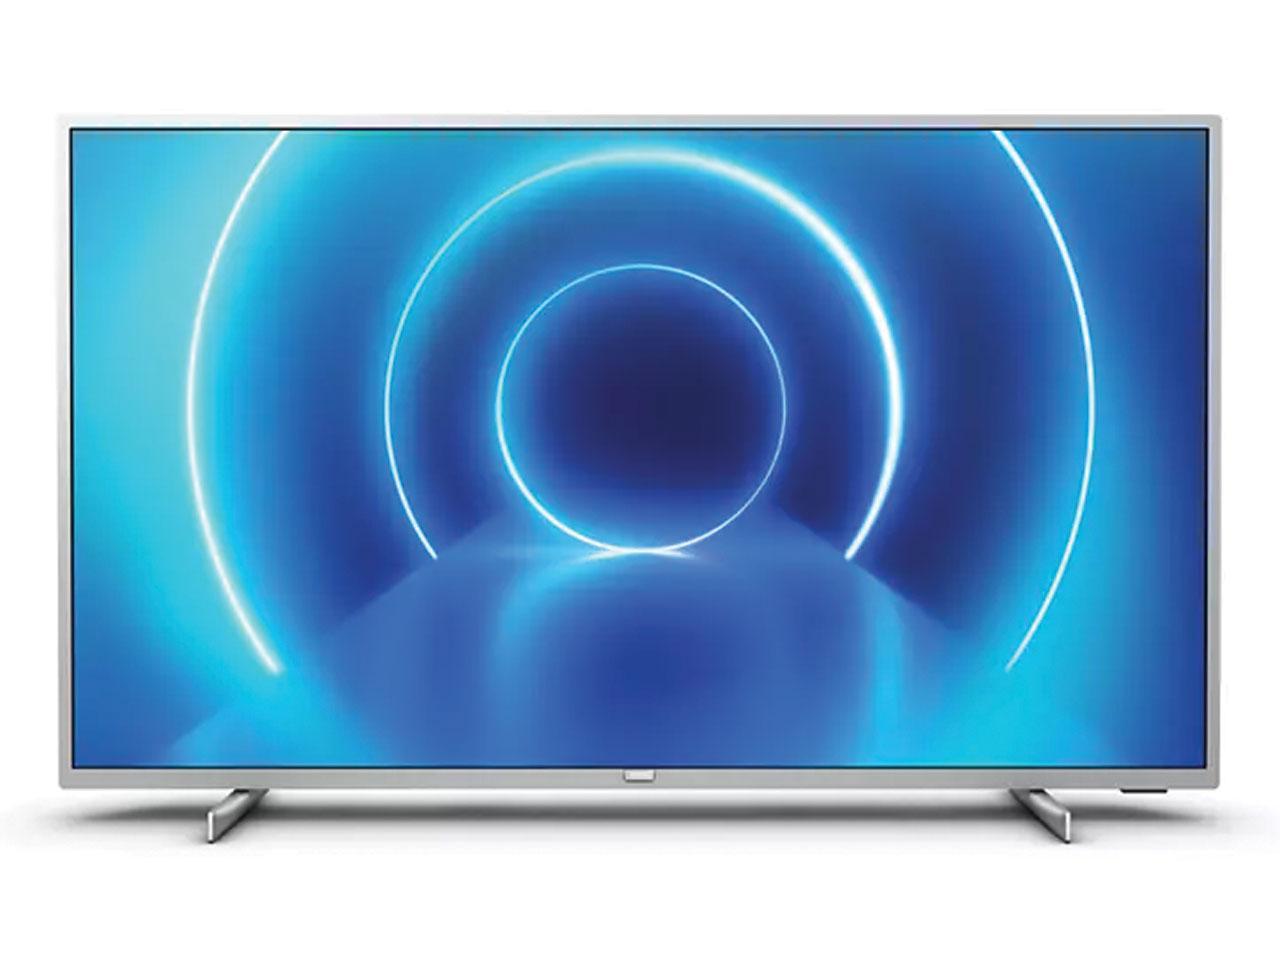 Televize PHILIPS 50PUS7555 + záruka 3 roky!